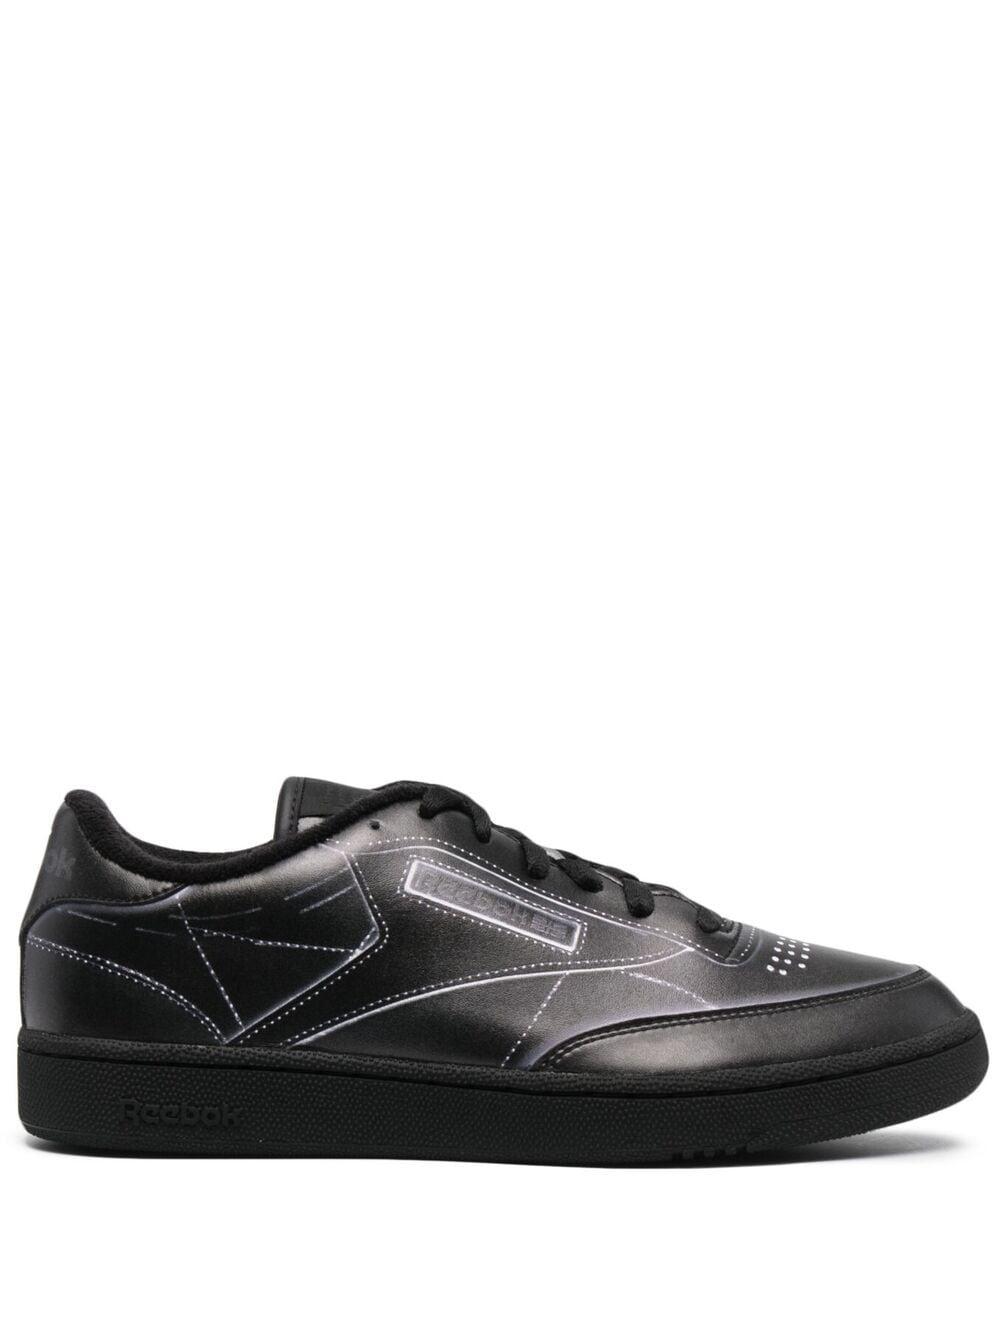 Reebok X Maison Margiela  project 0 cc tl uomo REEBOK X MAISON MARGIELA | Sneakers | H02361BLACK